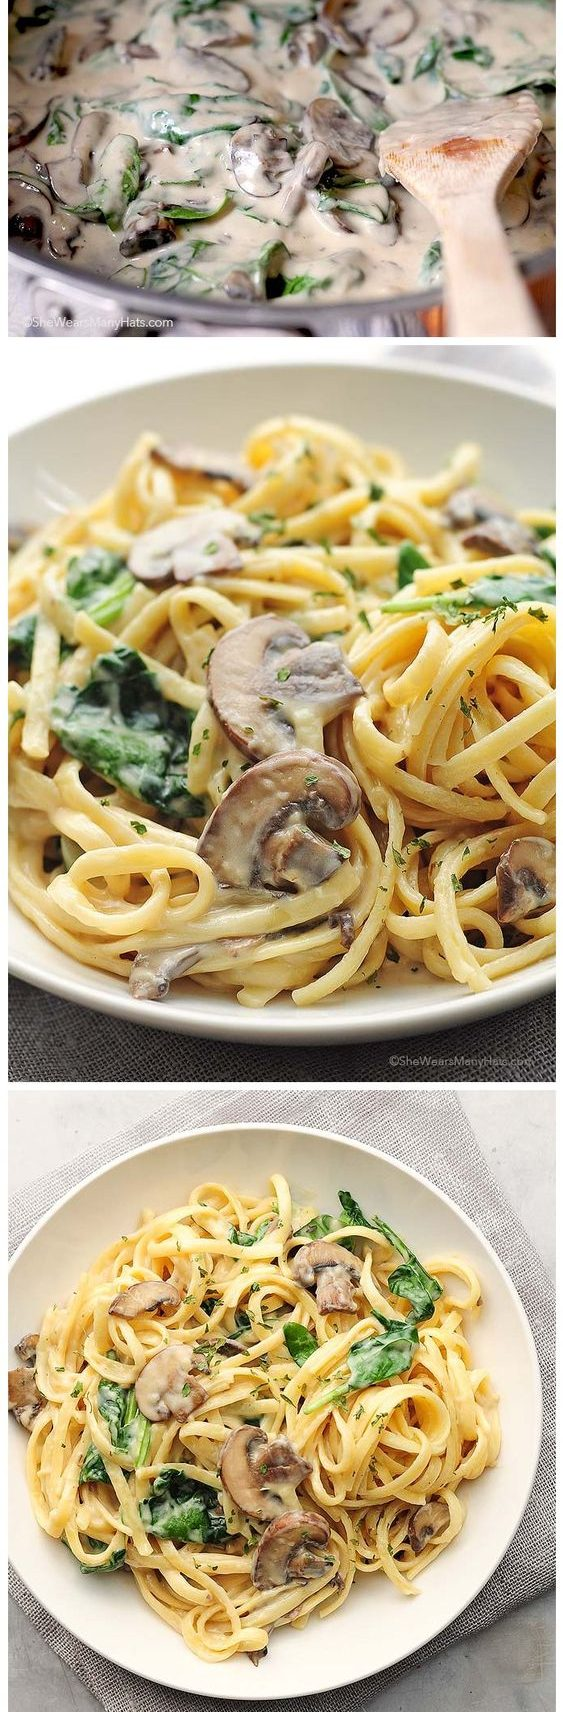 10 Best Pasta Recipes From Pinterest